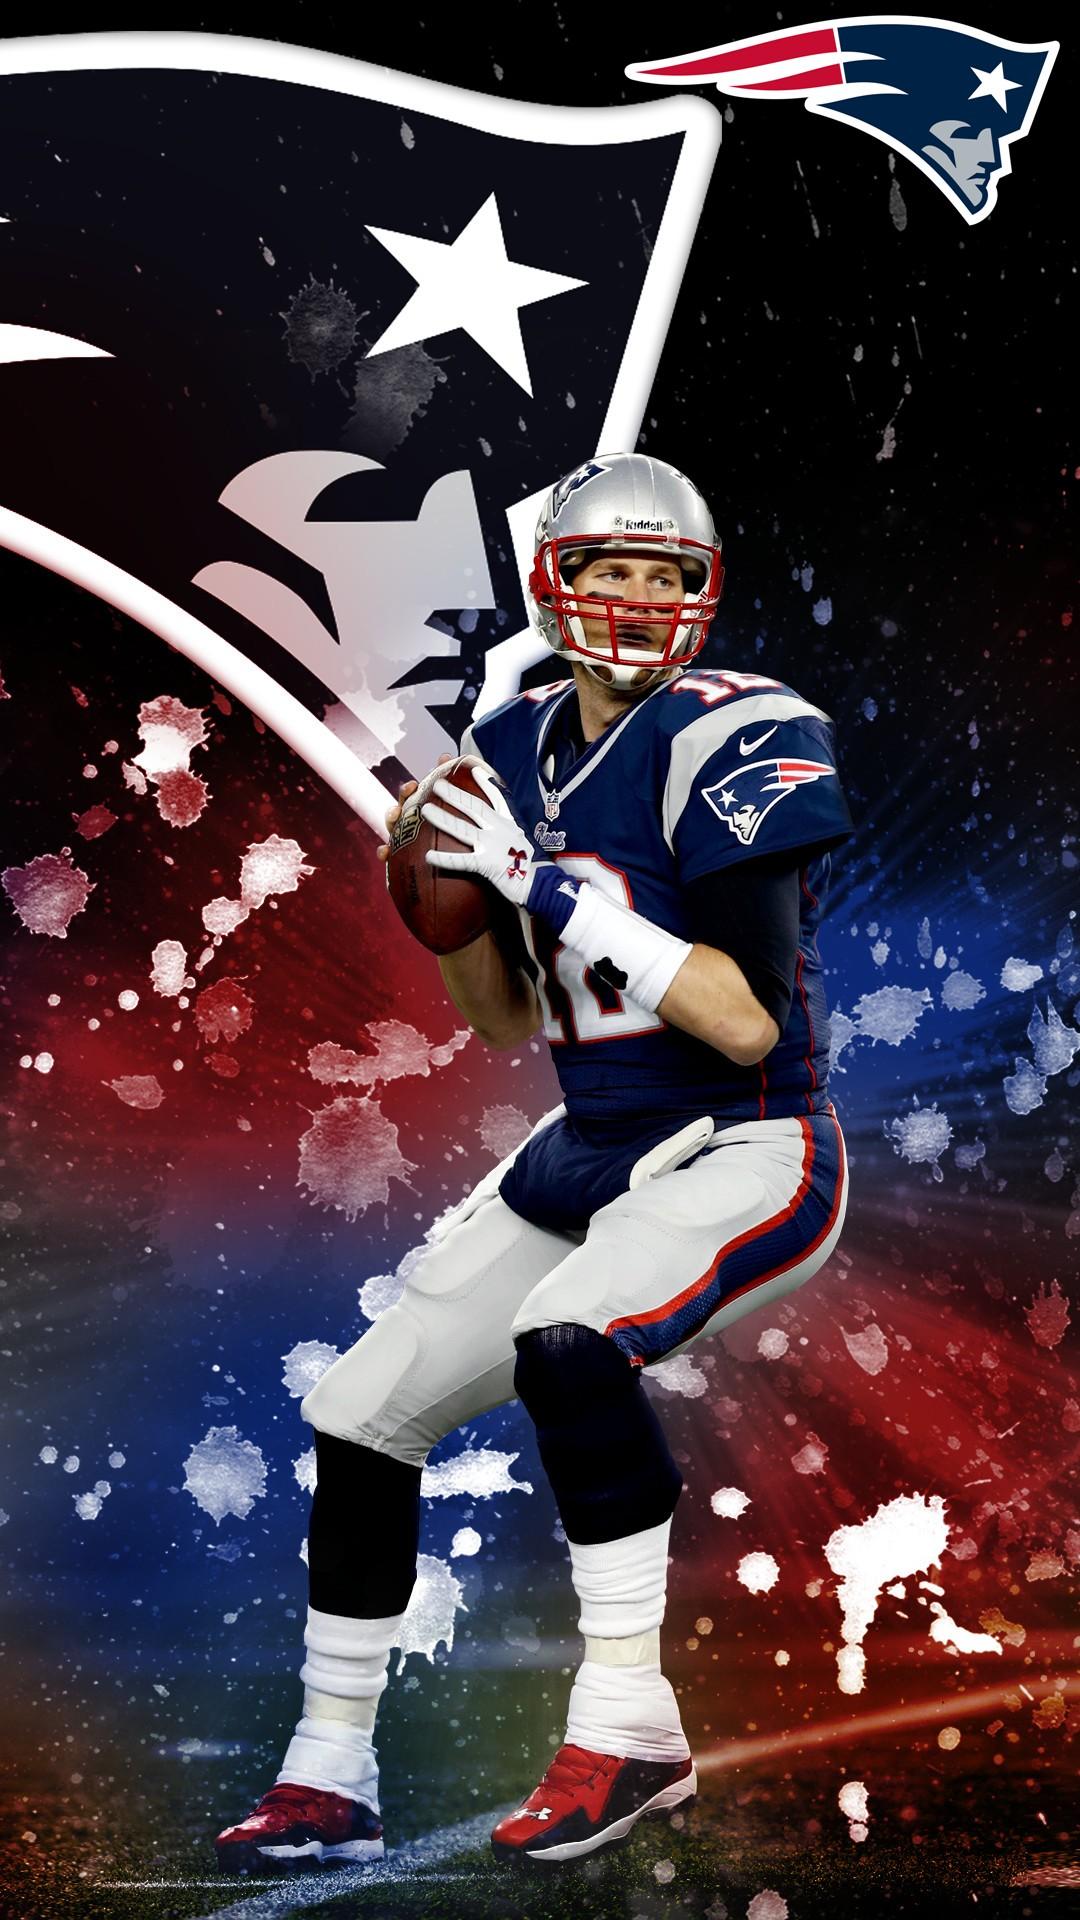 Tom Brady Iphone 7 Plus Wallpaper With Resolution Pixel - New England Patriots - HD Wallpaper